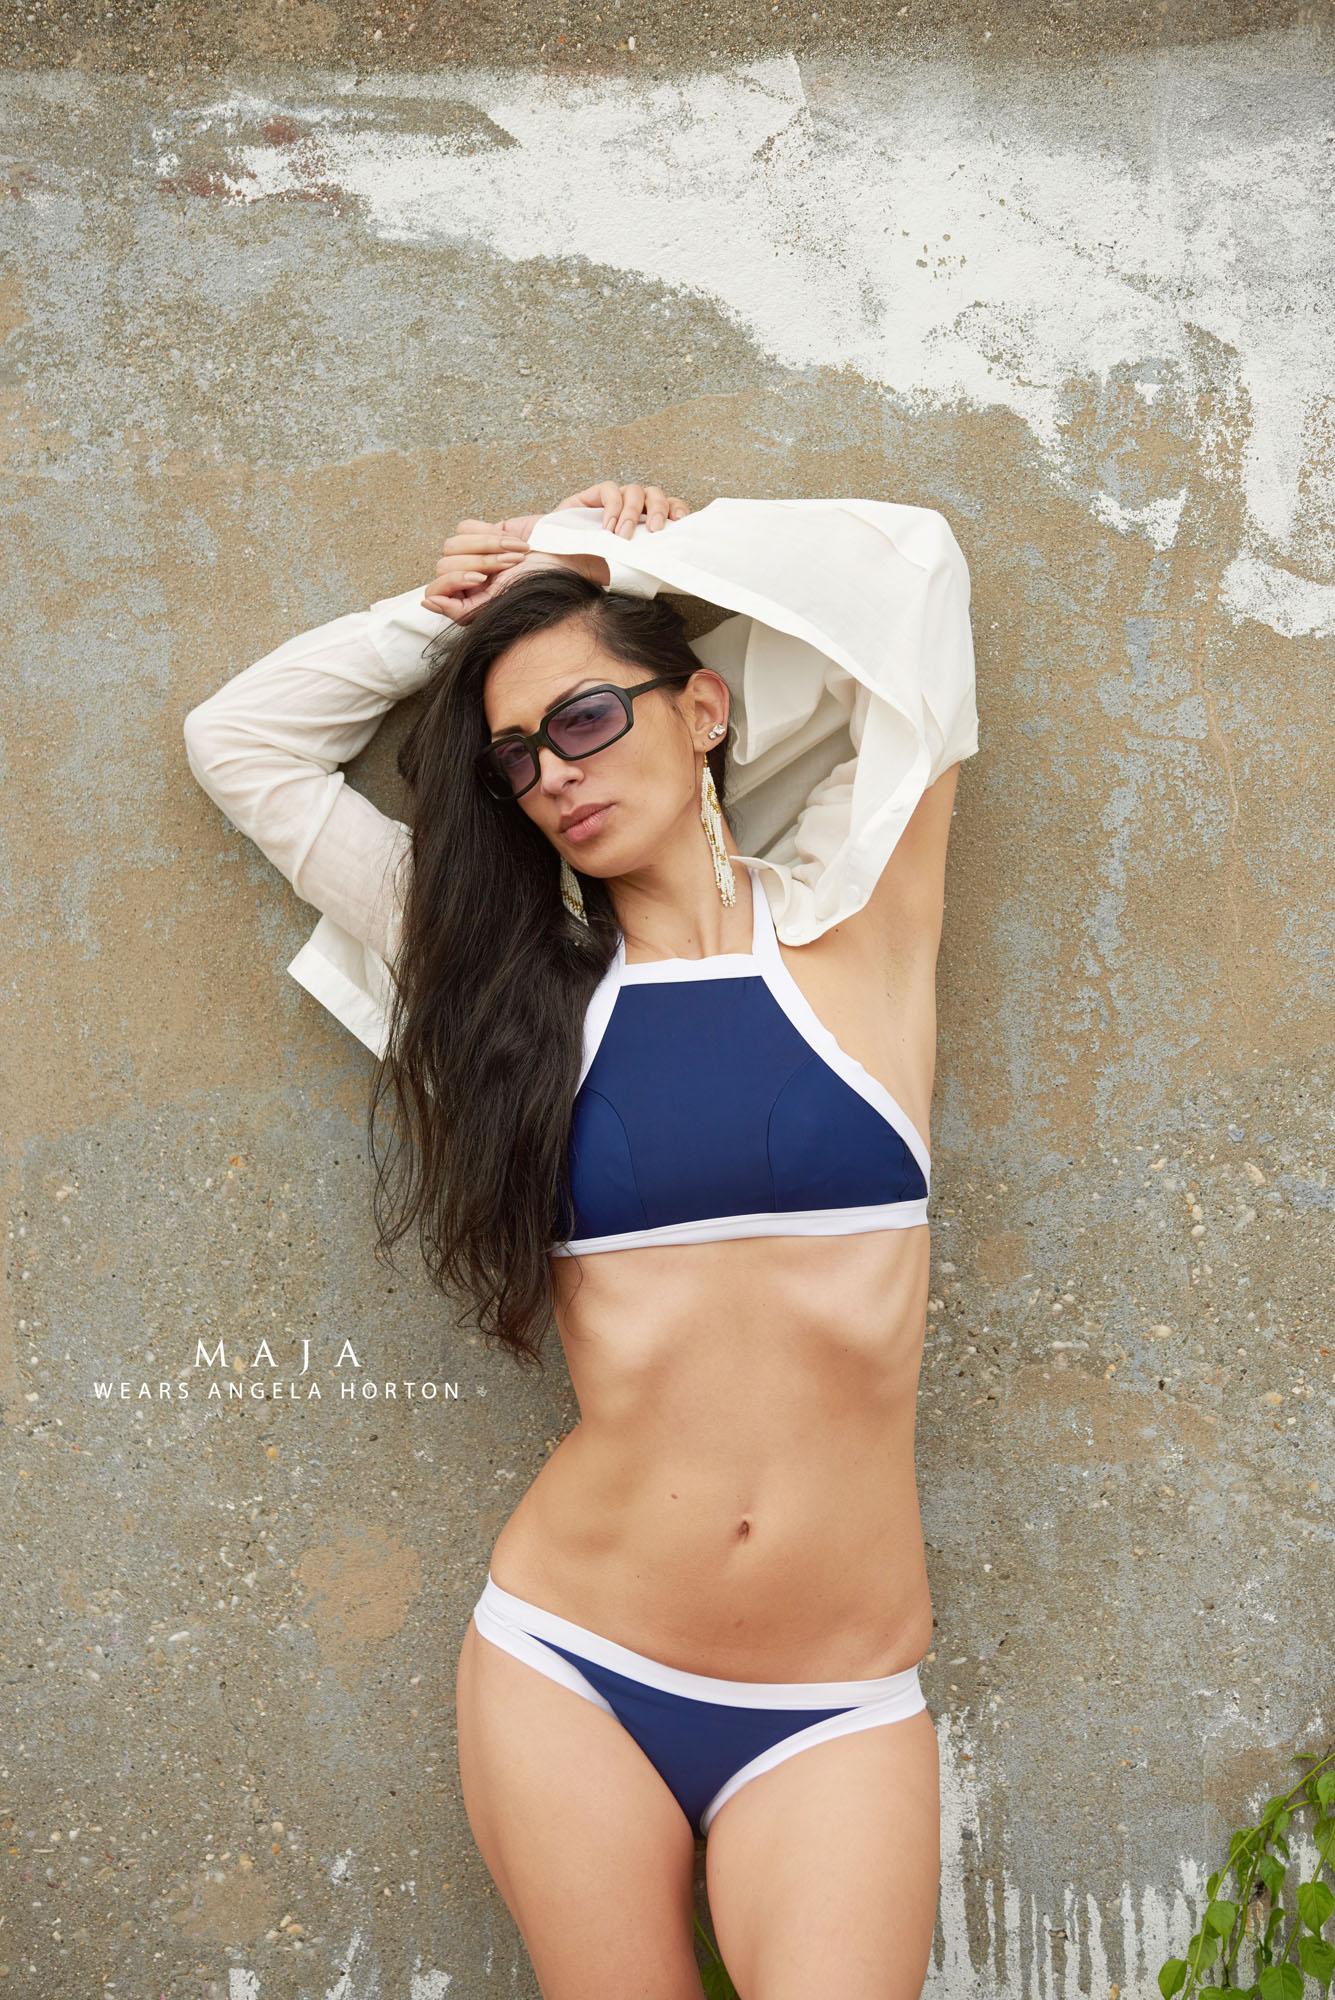 http://sageandlavender.com/wp-content/uploads/2017/11/Angela_Horton_57.jpg